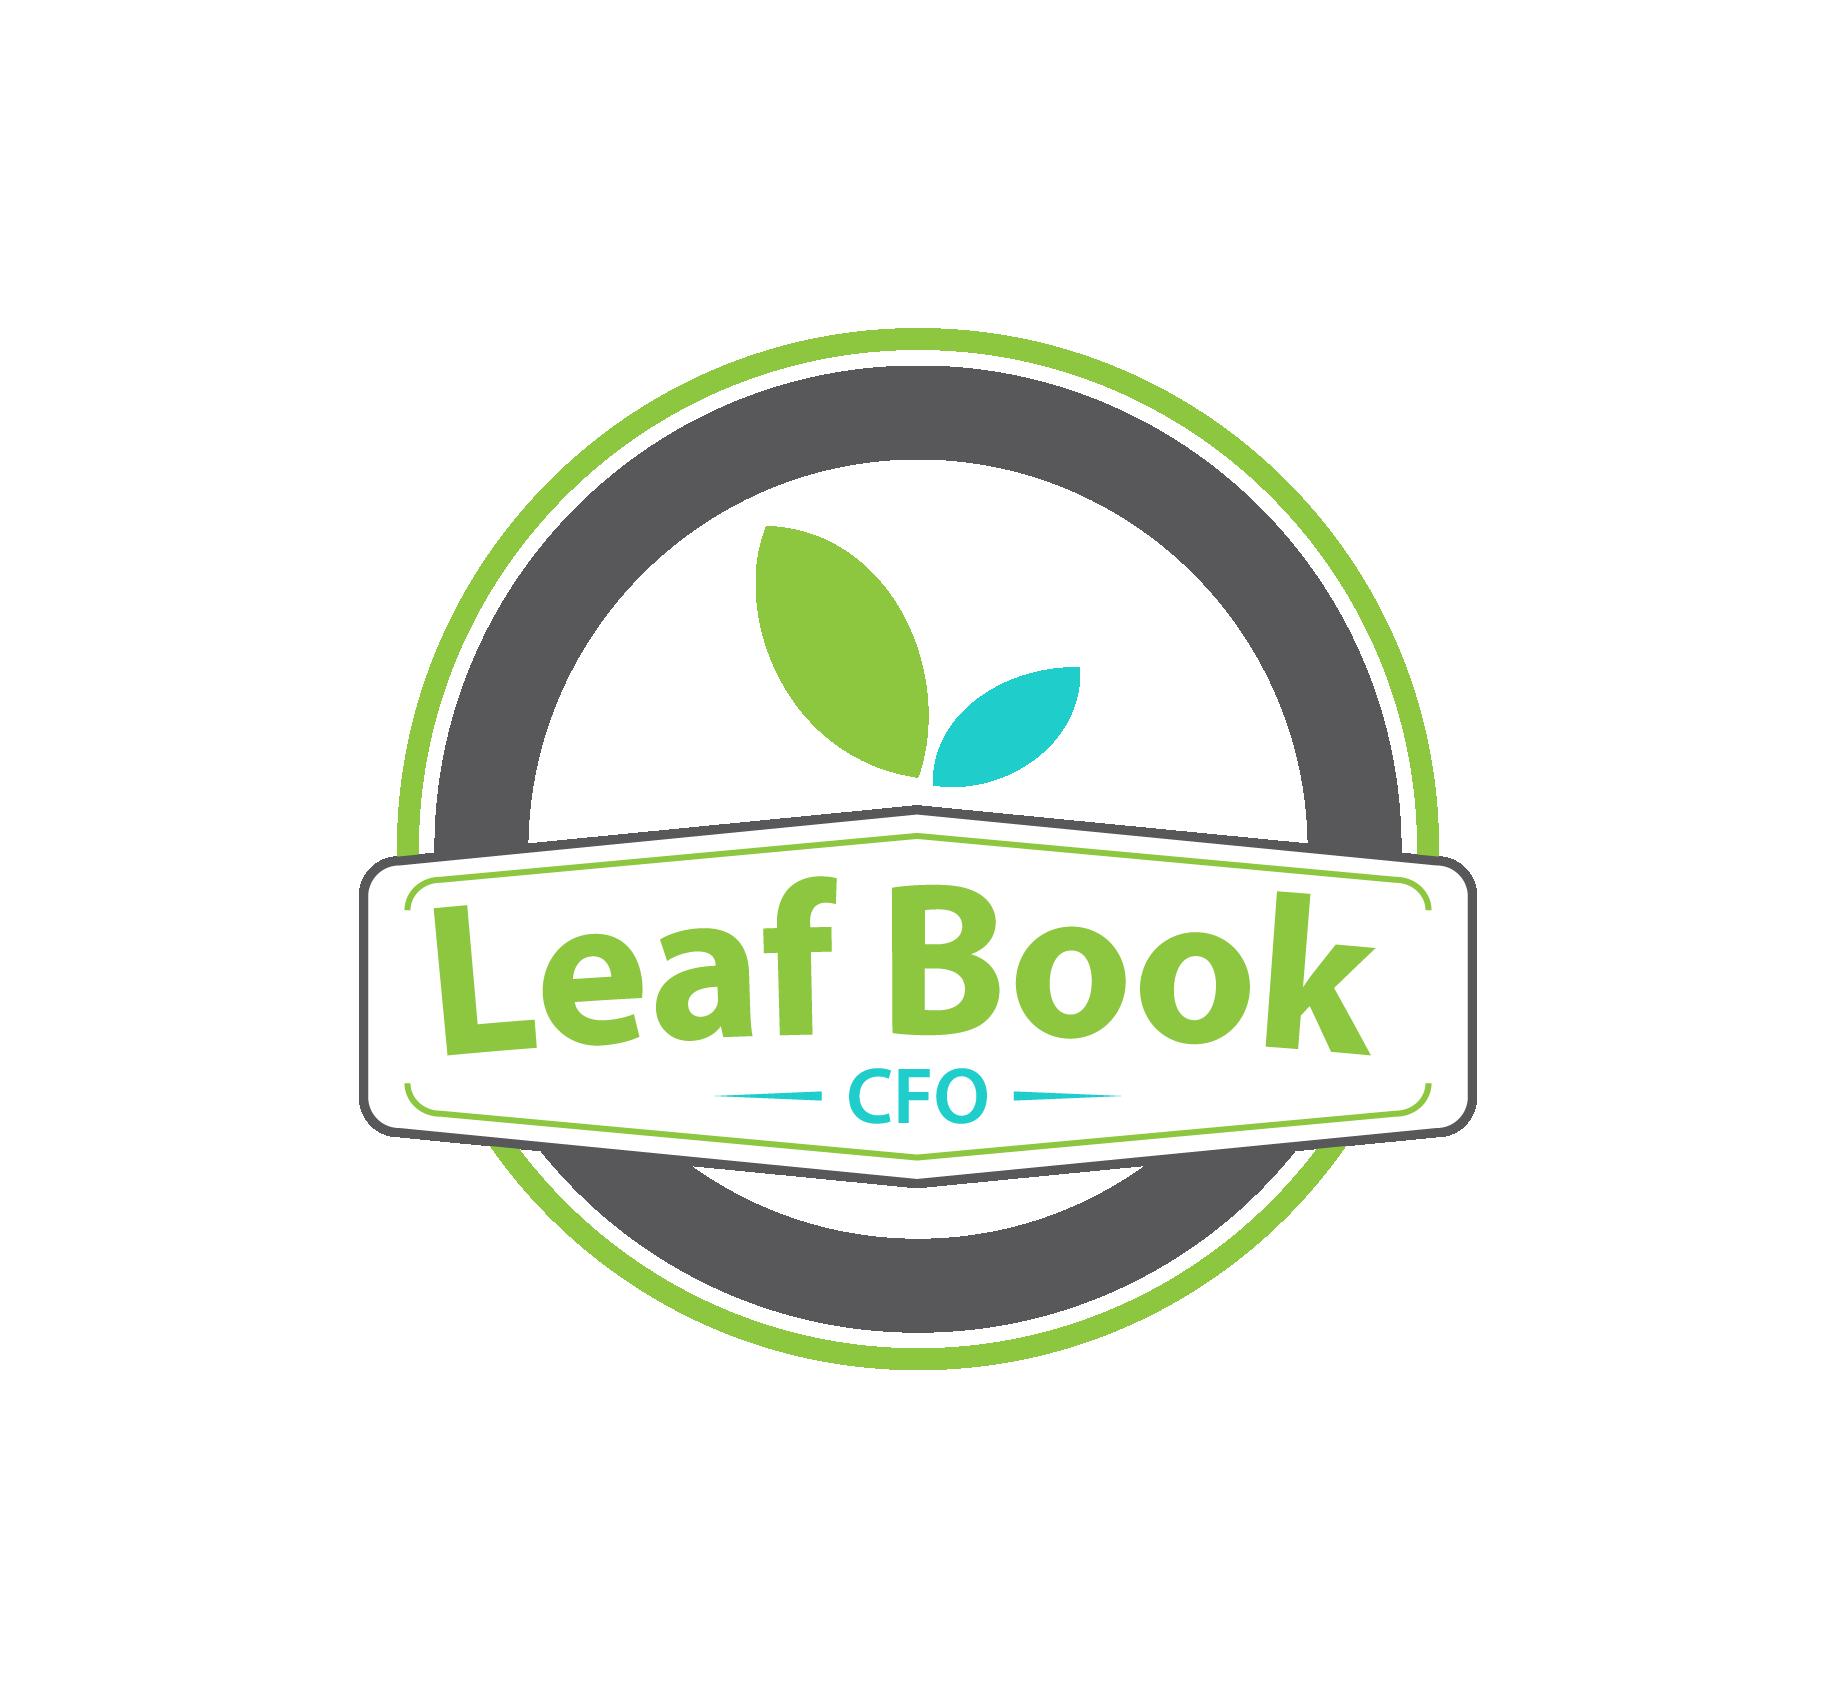 LeafBookCFO_Badge-2